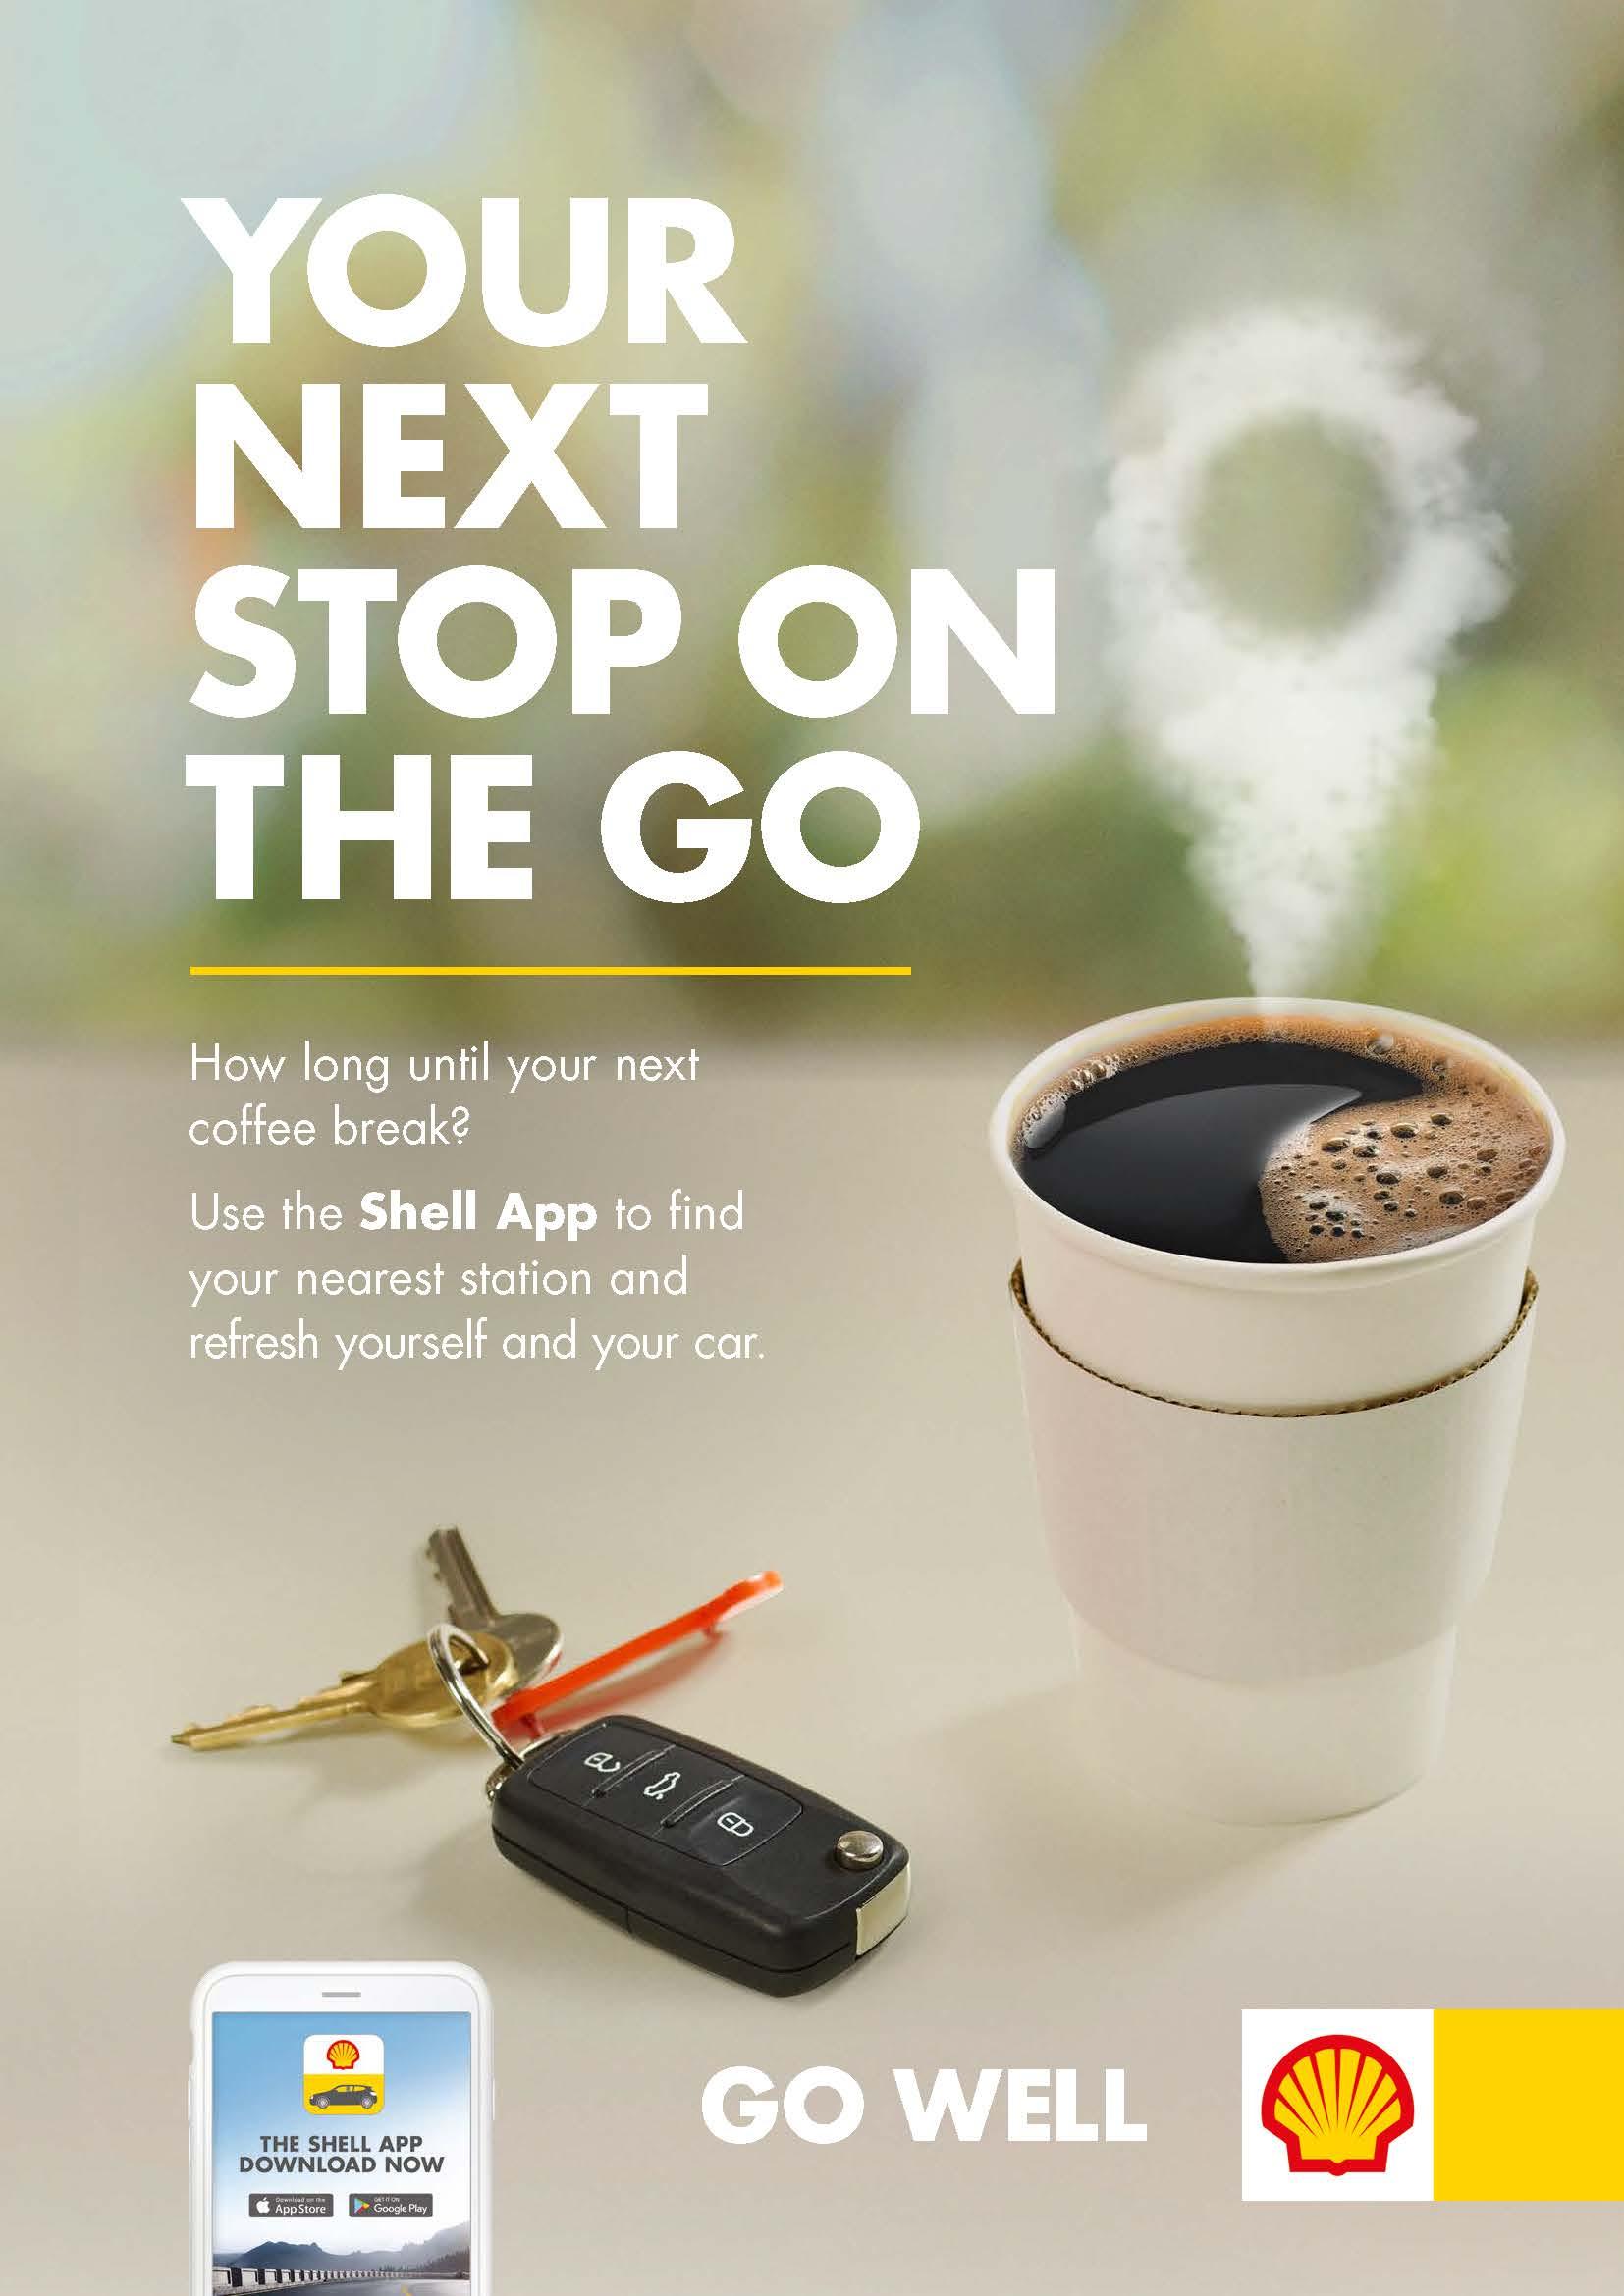 Next Stop on Go.jpg